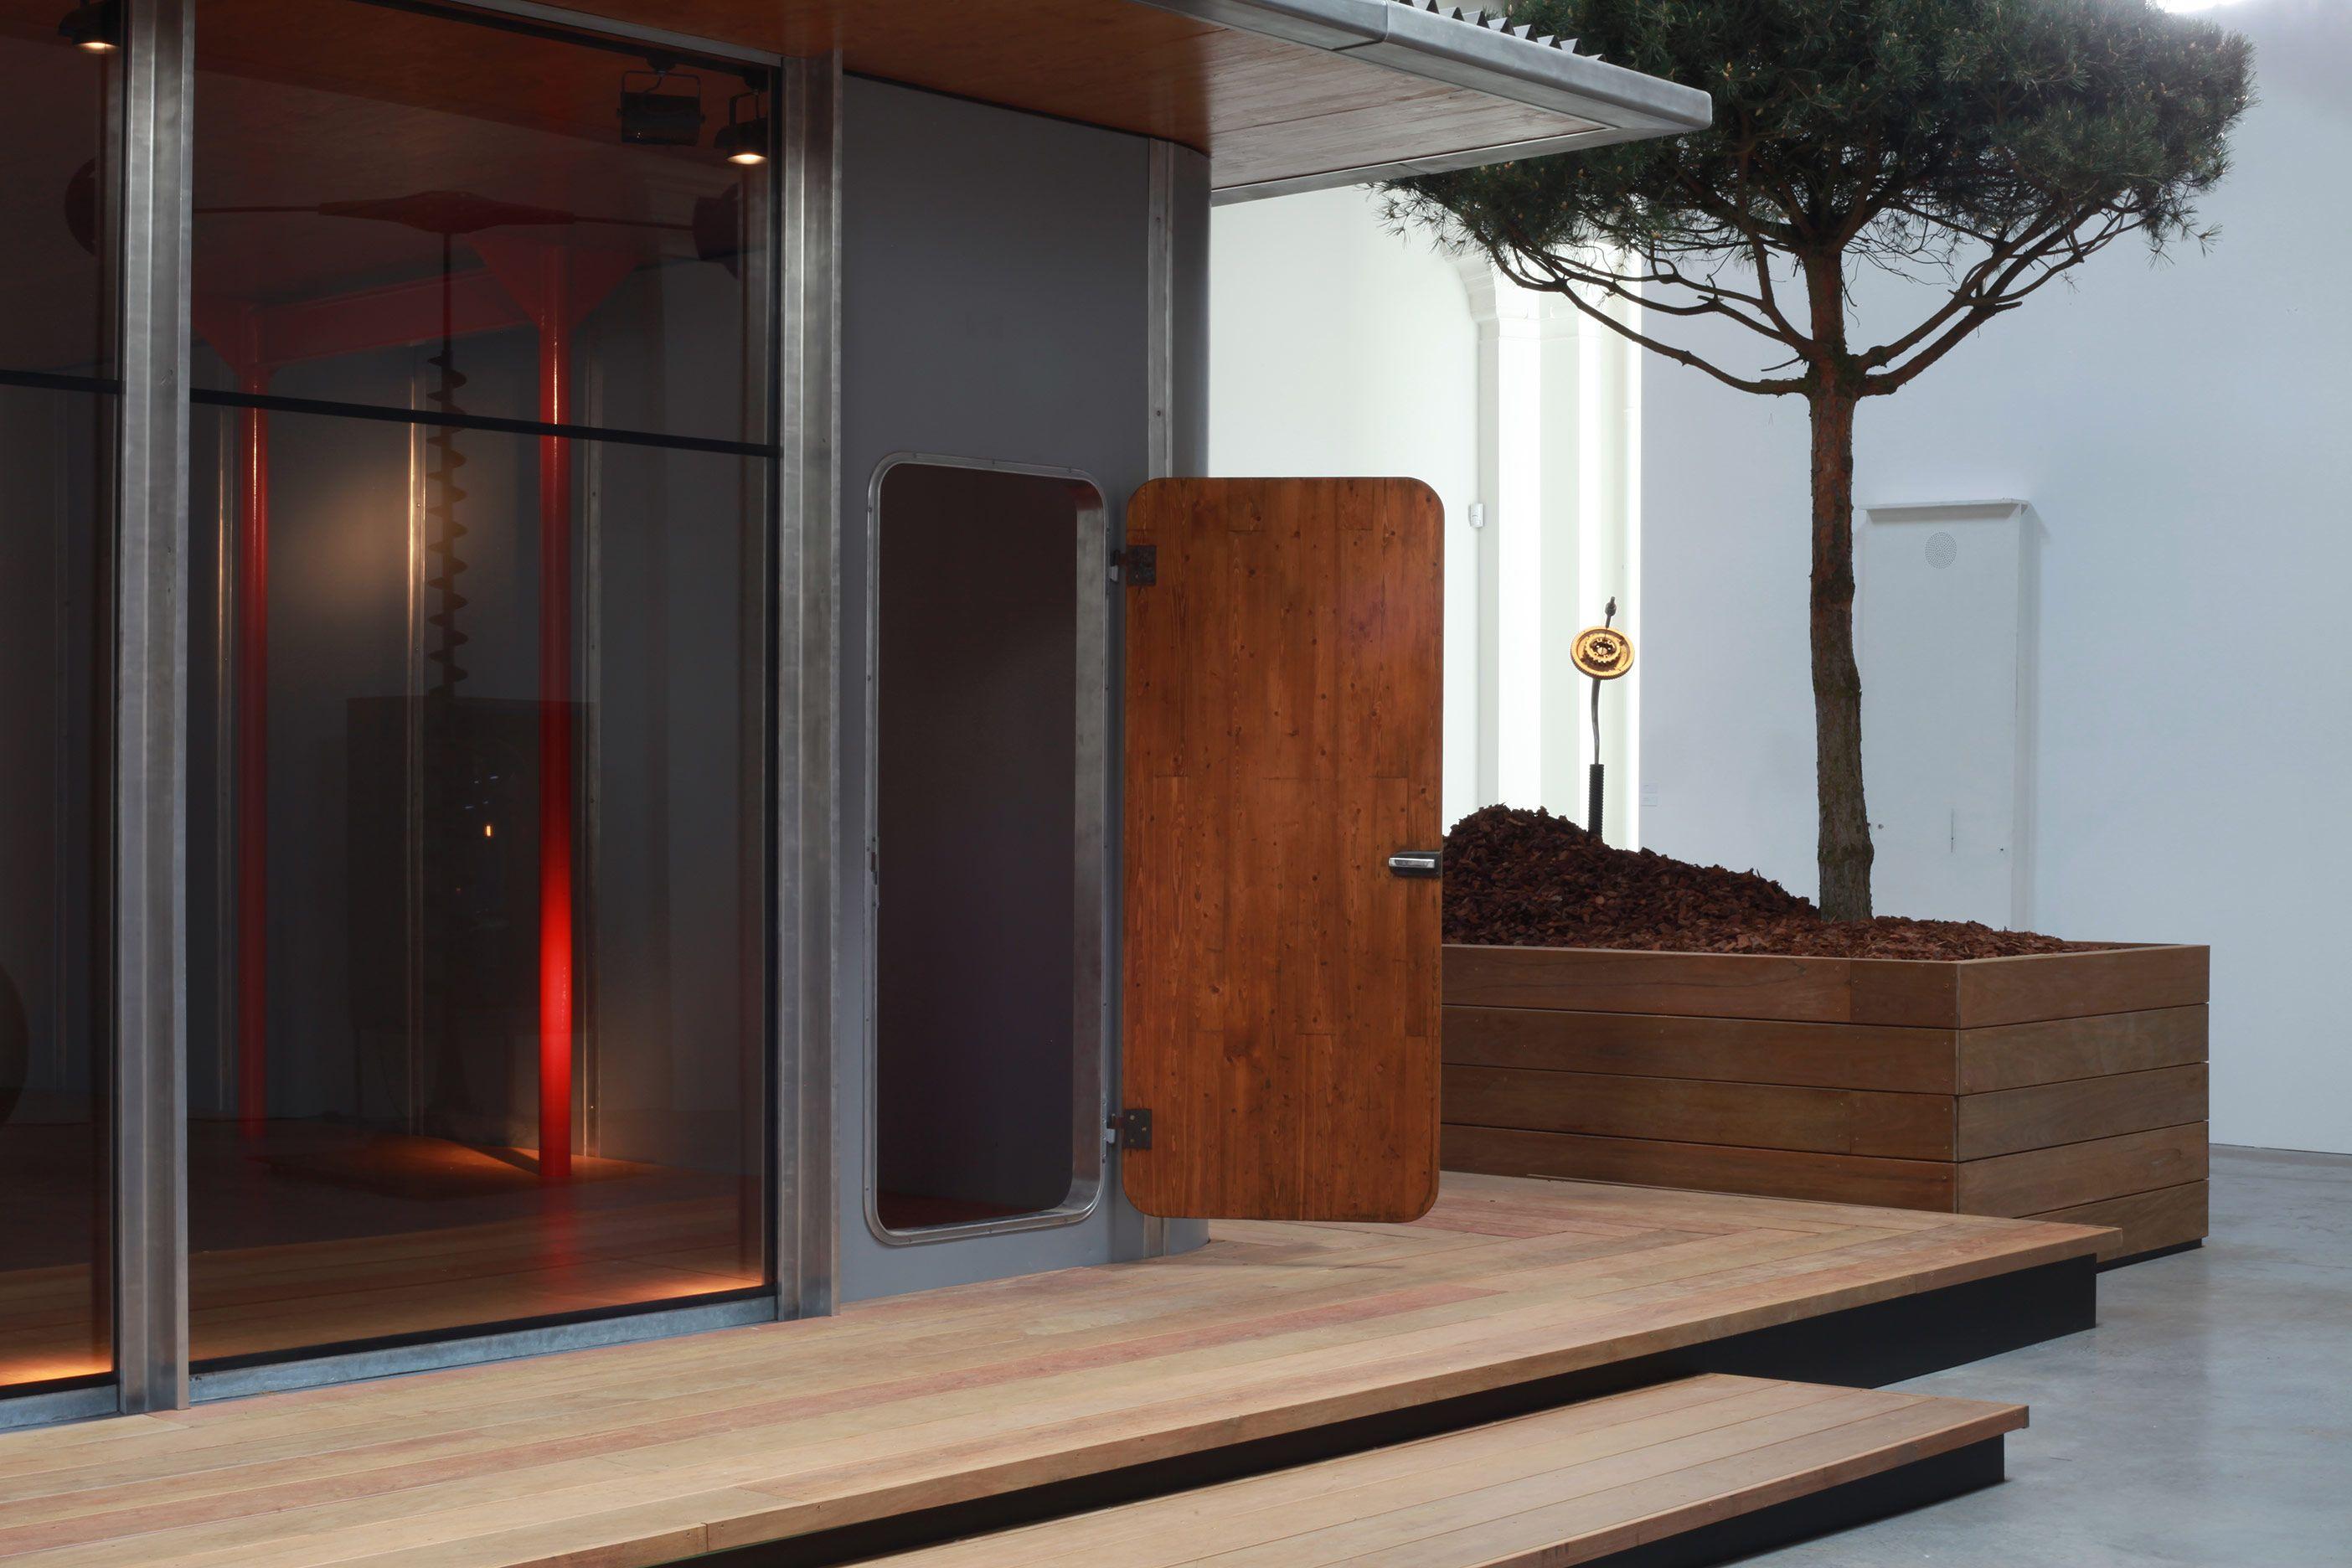 prouv takis patinoire royale jean prouve pinterest house design shed homes et house. Black Bedroom Furniture Sets. Home Design Ideas